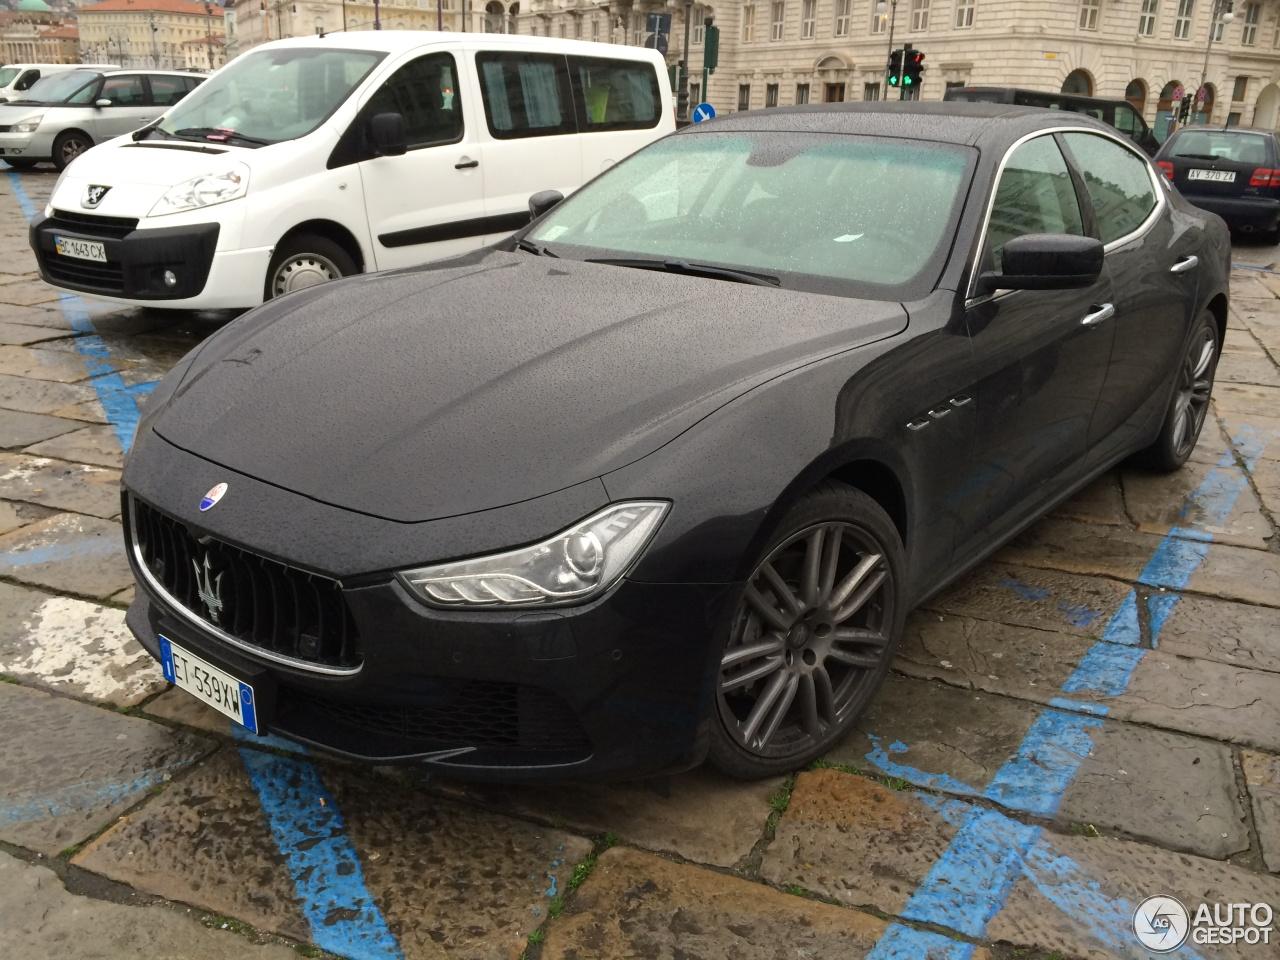 Maserati Ghibli 2013 11 febbraio 2014 Autogespot